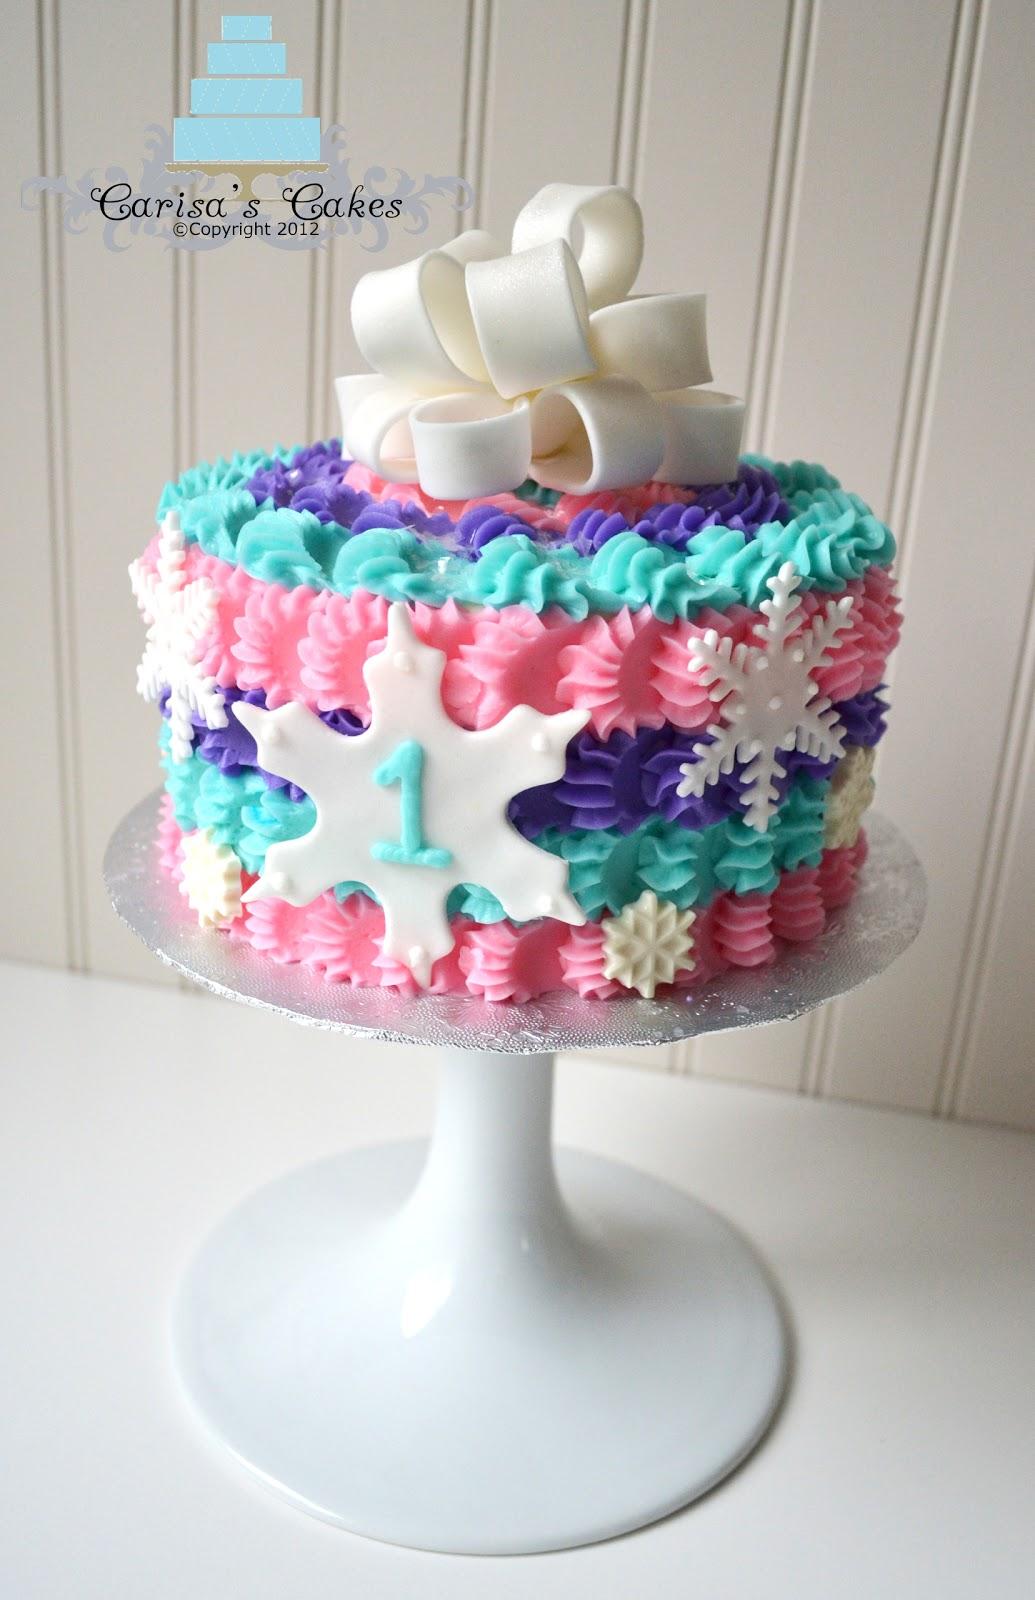 Cake Ideas For Cake Smash : Carisa s Cakes: Winter Smash Cake